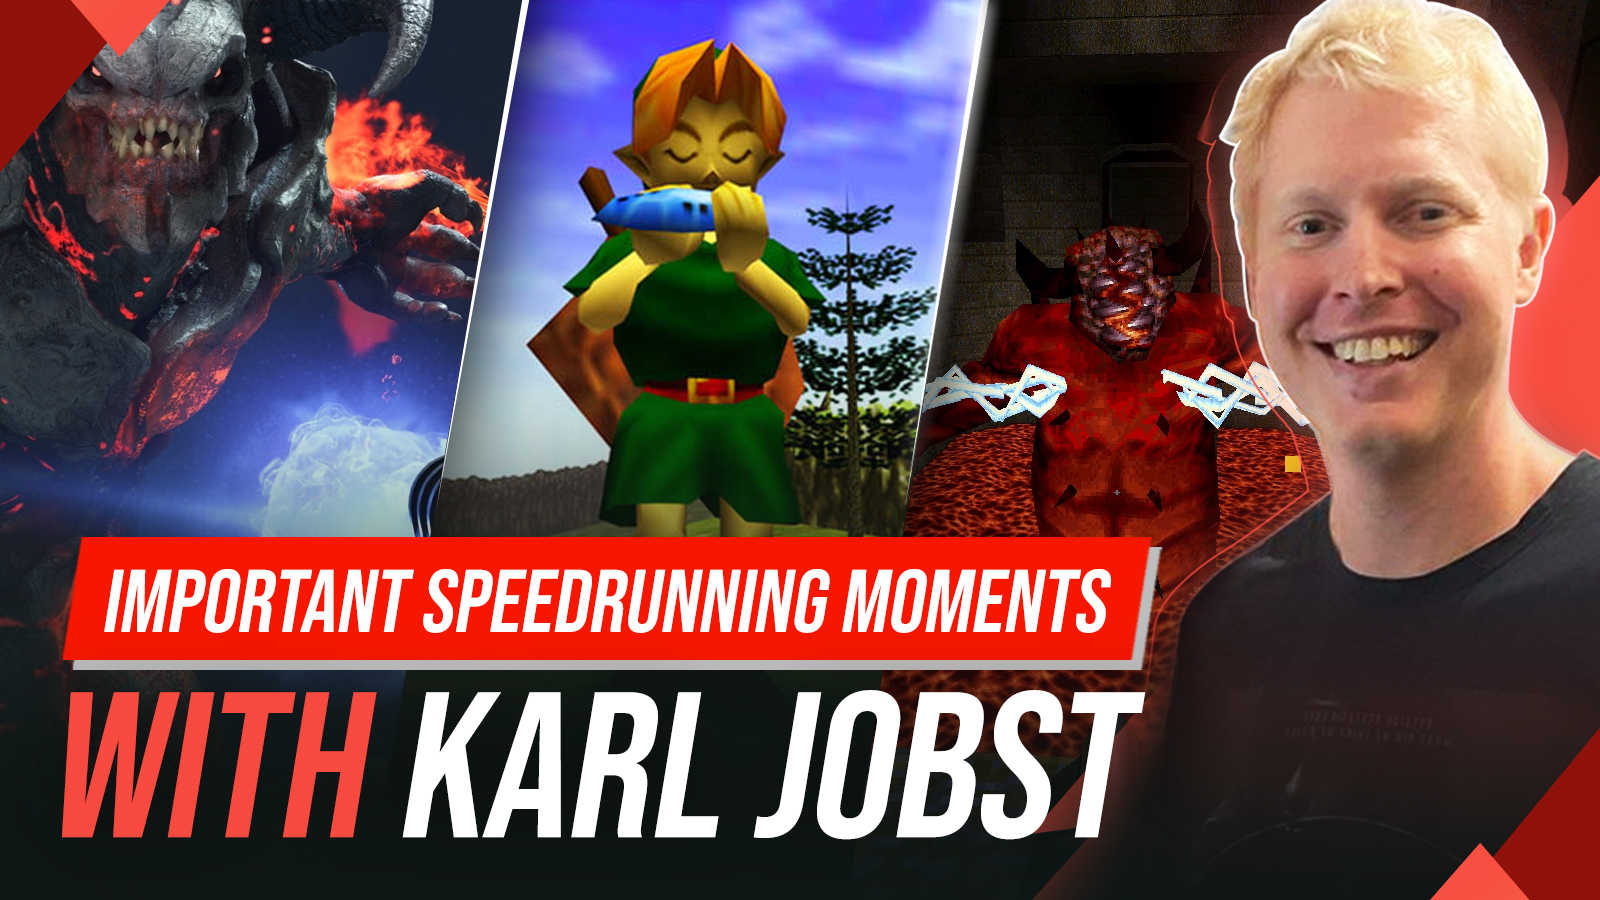 Karl Jobst and speedrunning games